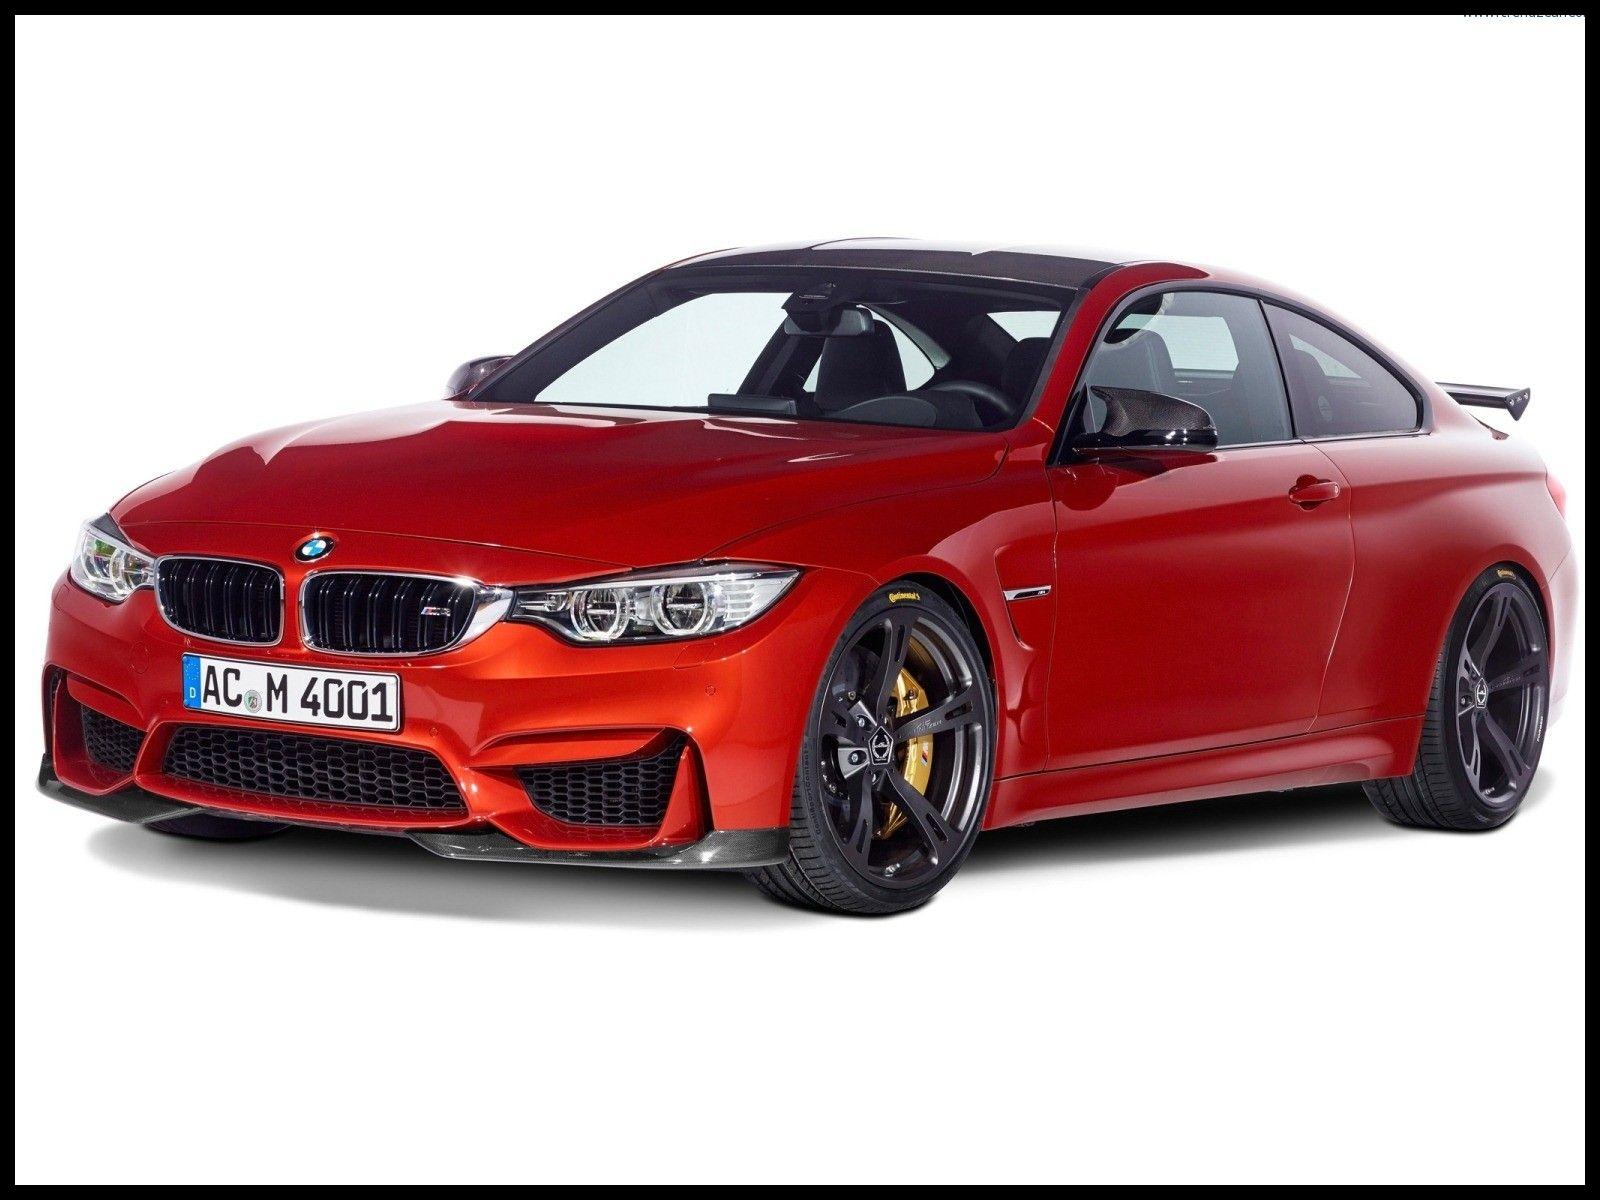 2014 AC Schnitzer BMW M4 x